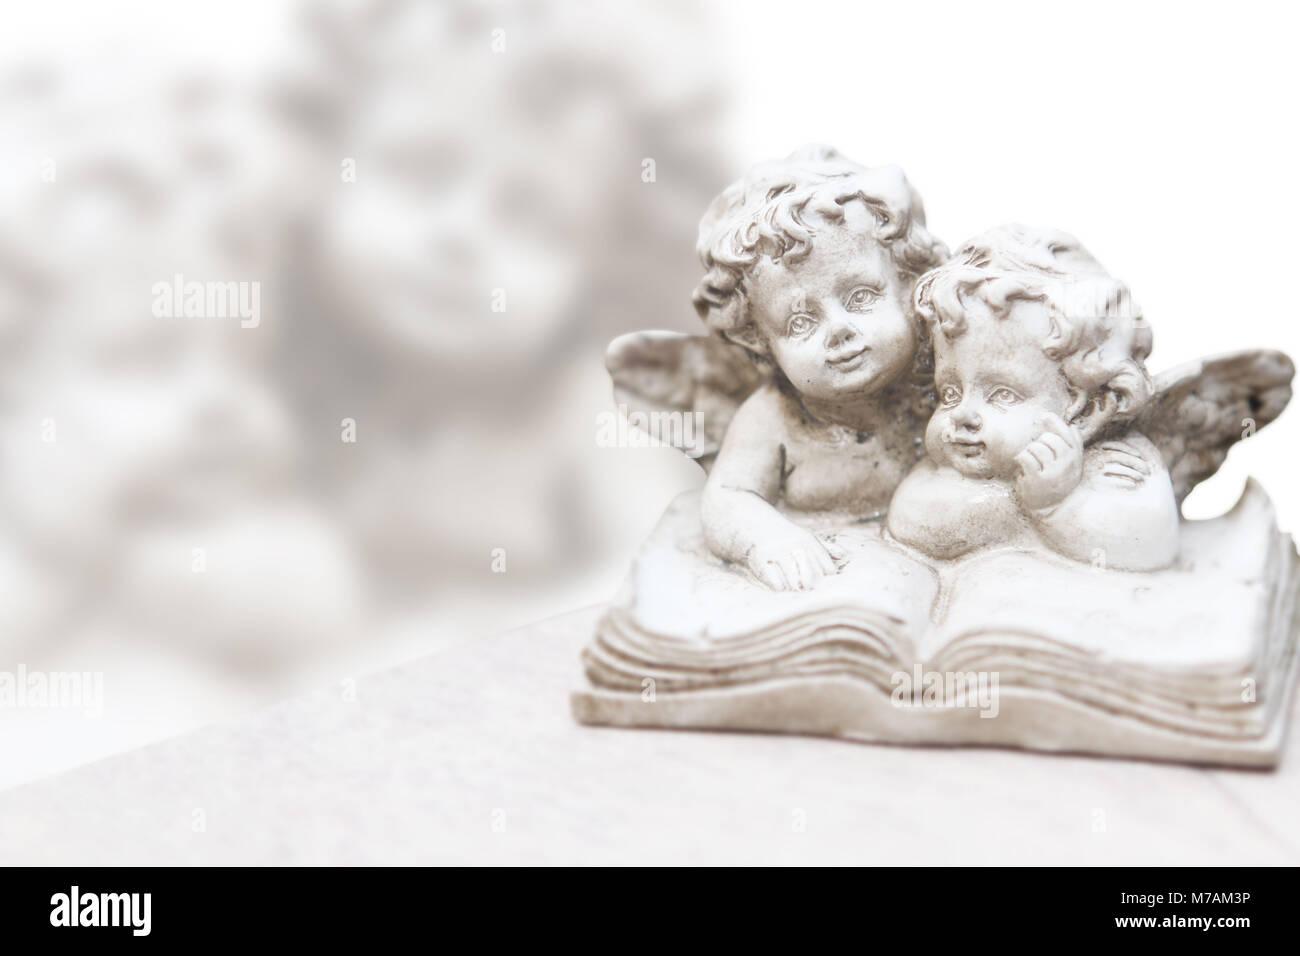 Libro conmemorativo con ángeles, Tarjeta de pésame, Imagen De Stock